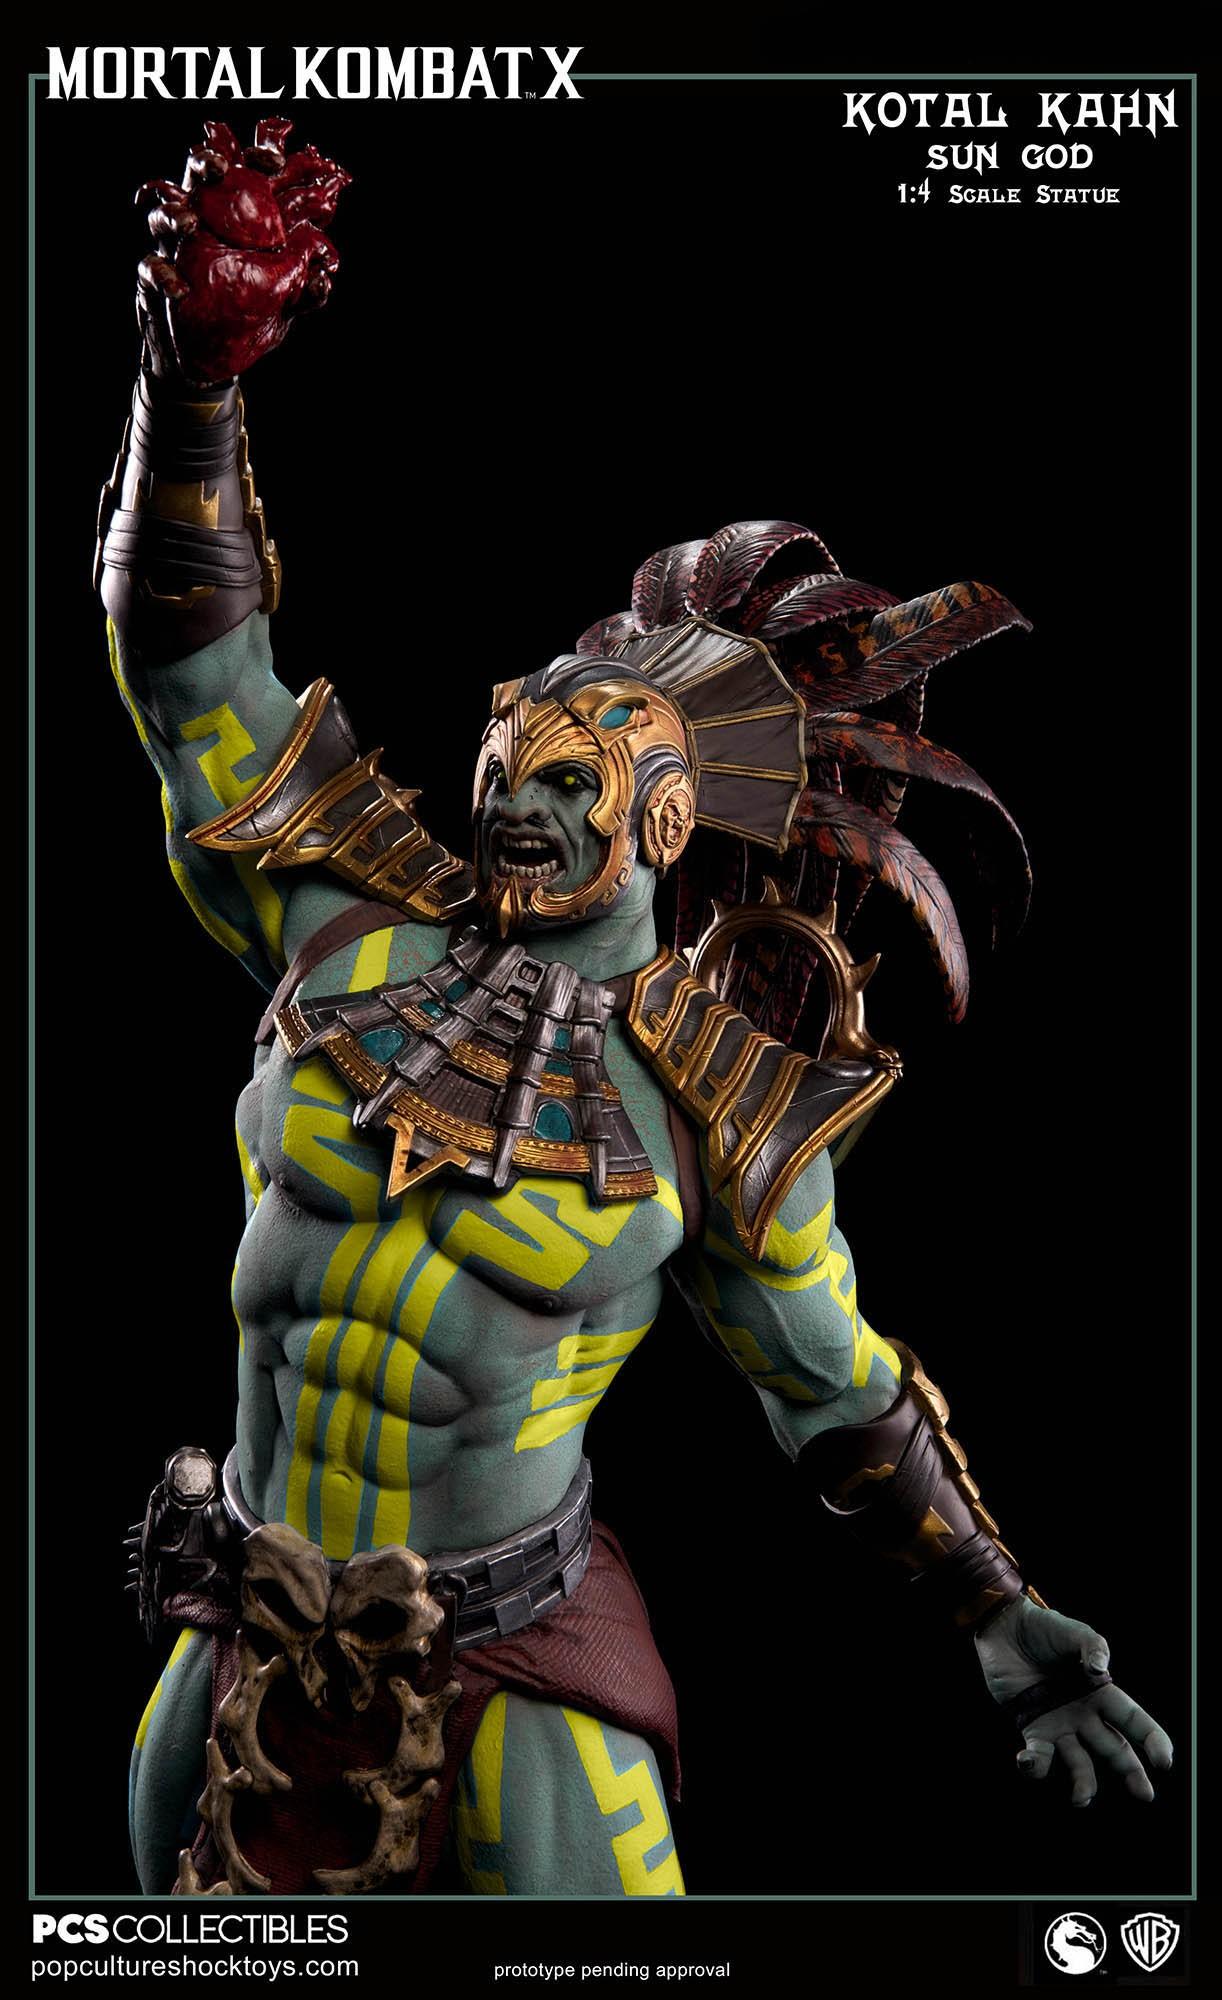 [Pop Culture Shock] Mortal Kombat X: Kotal Kahn 1:4 scale PCS-Kotal-Kahn-Sun-God-018